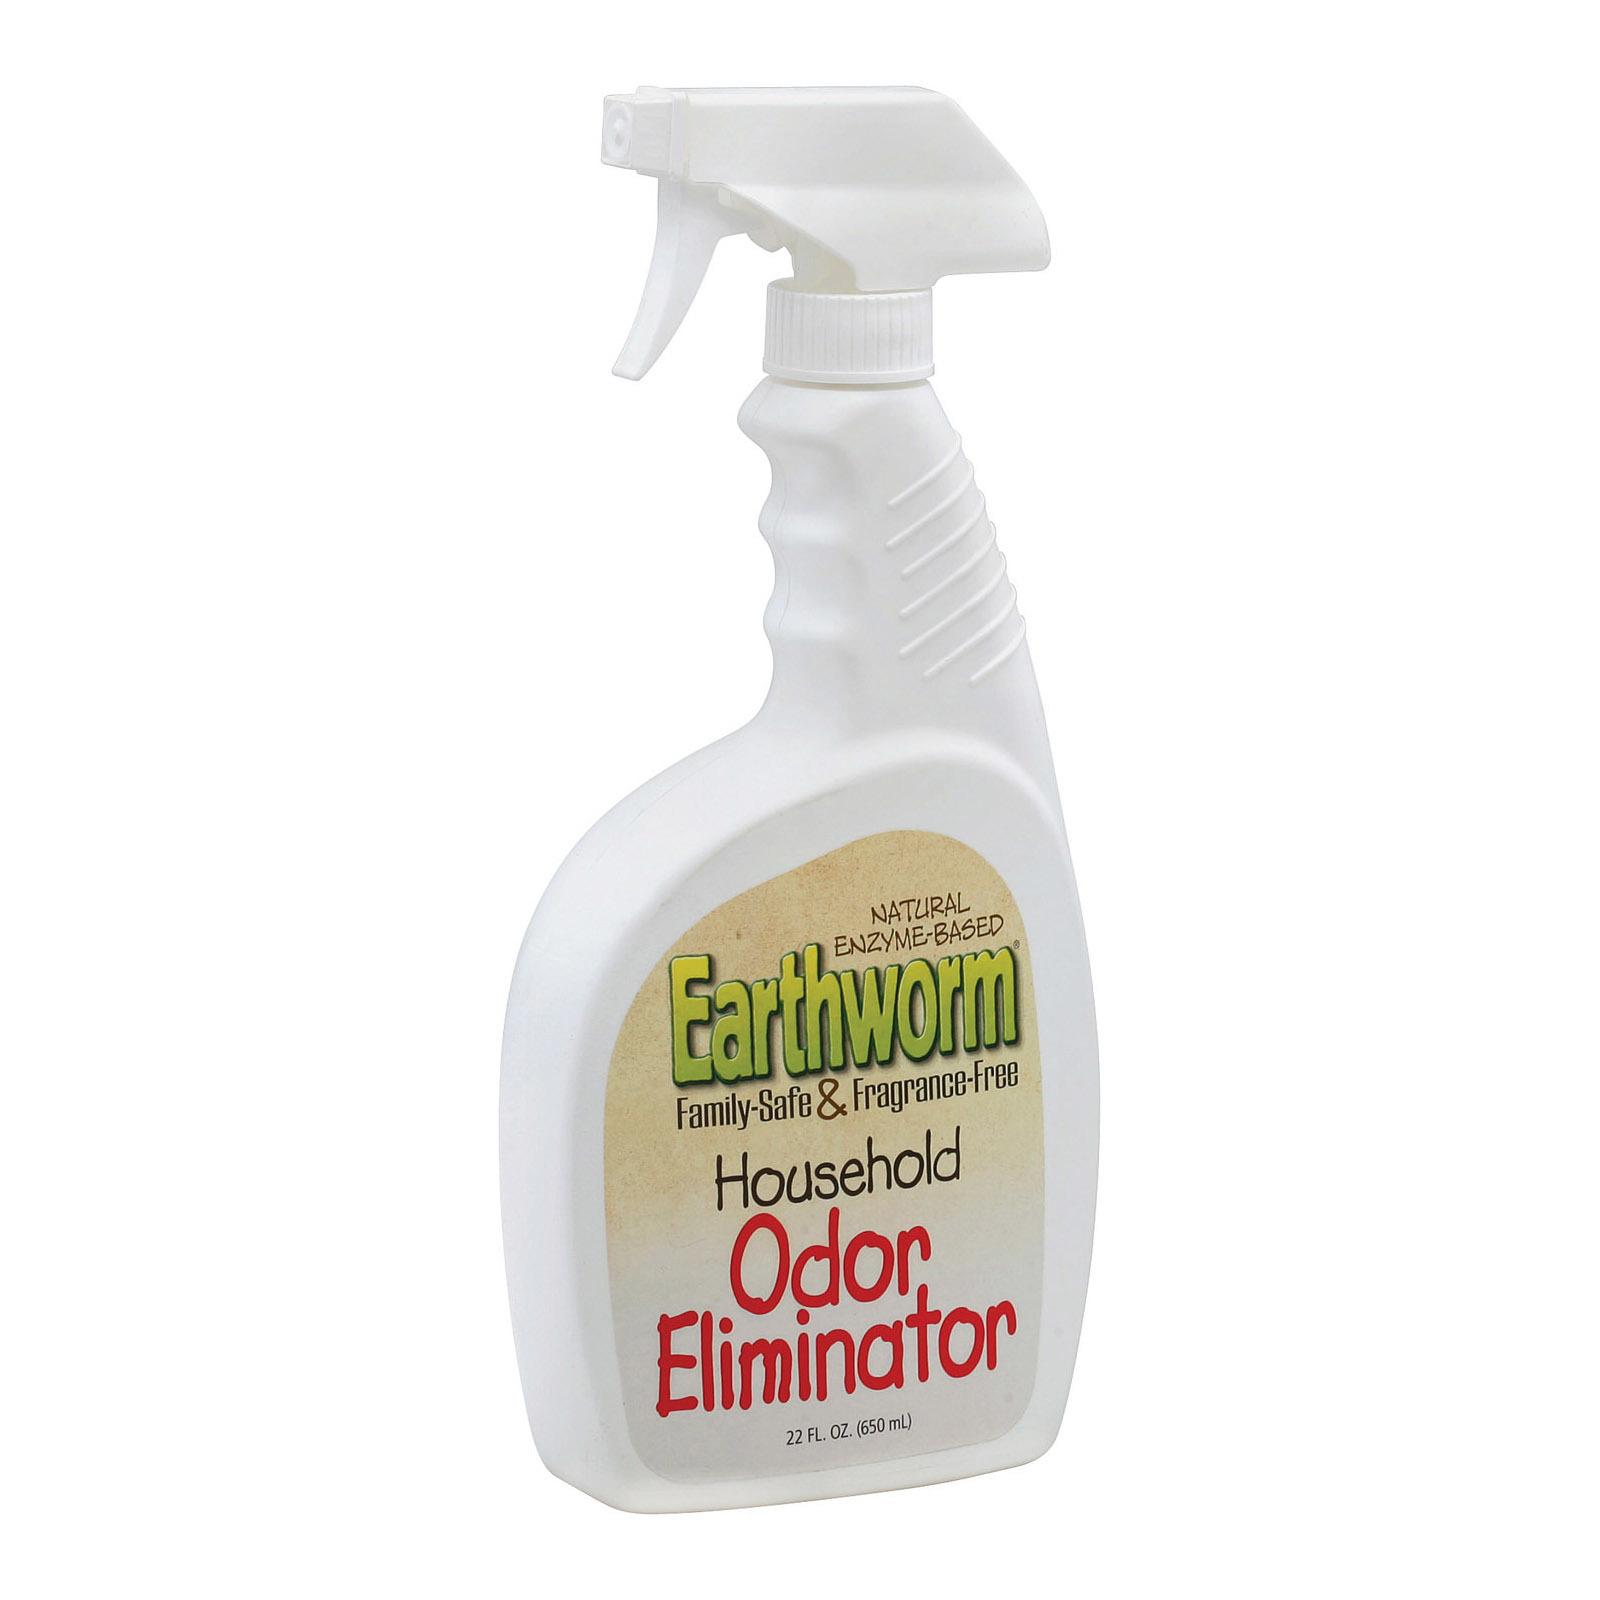 Earthworm Household Odor Eliminator - Case of 6 - 22 FL oz.